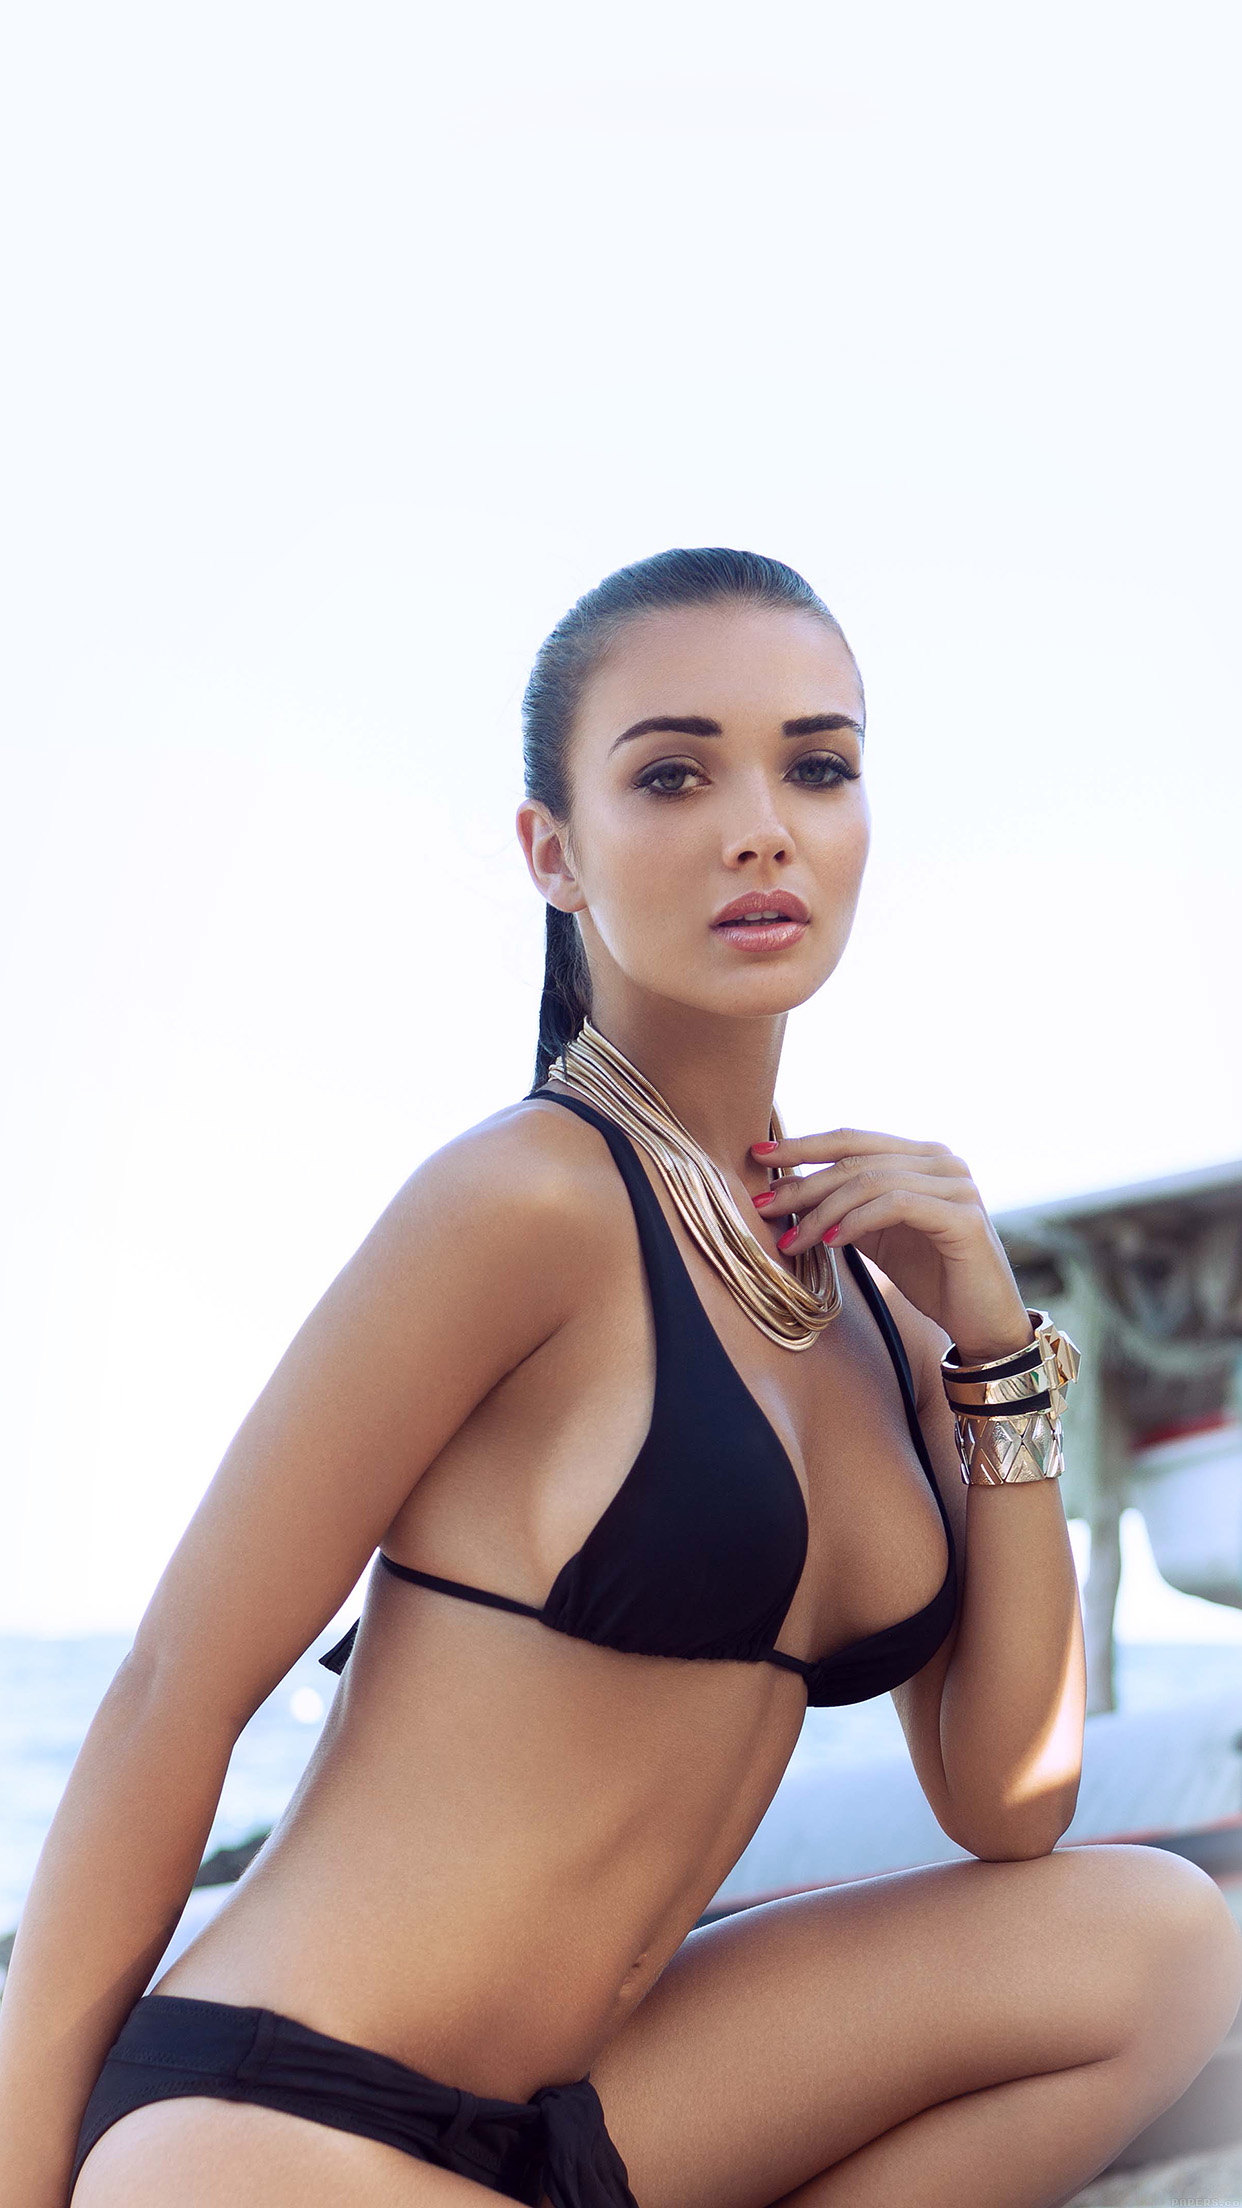 hd63-amy-jackson-bikini-sexy-girl - papers.co